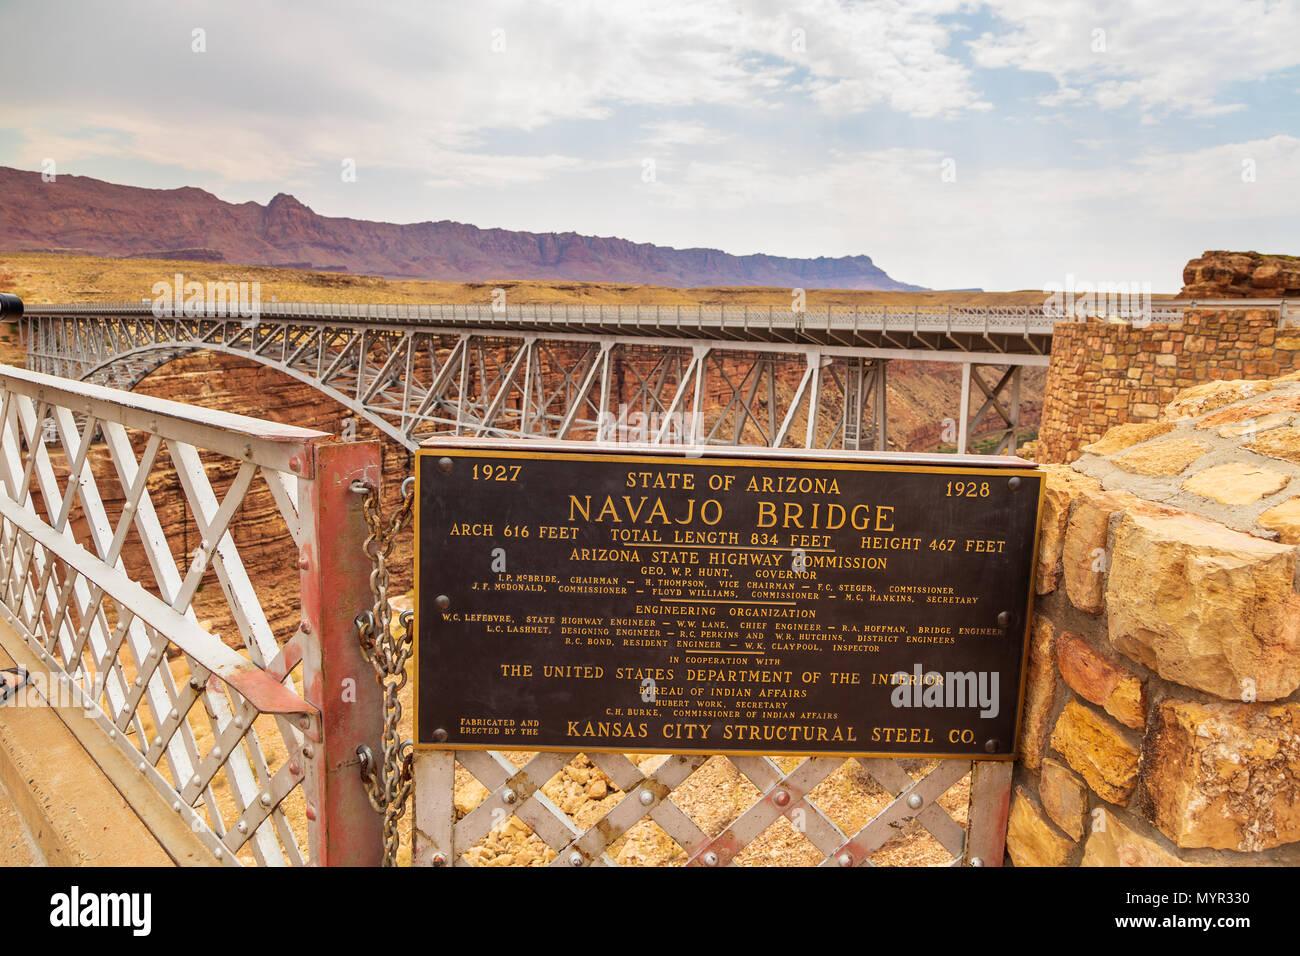 Navajo Bridge, Arizona, USA- 06 September 2017: Historic Navajo Bridge spans Marble Canyon in northern Arizona. Is a pair of steel arch bridges that c - Stock Image